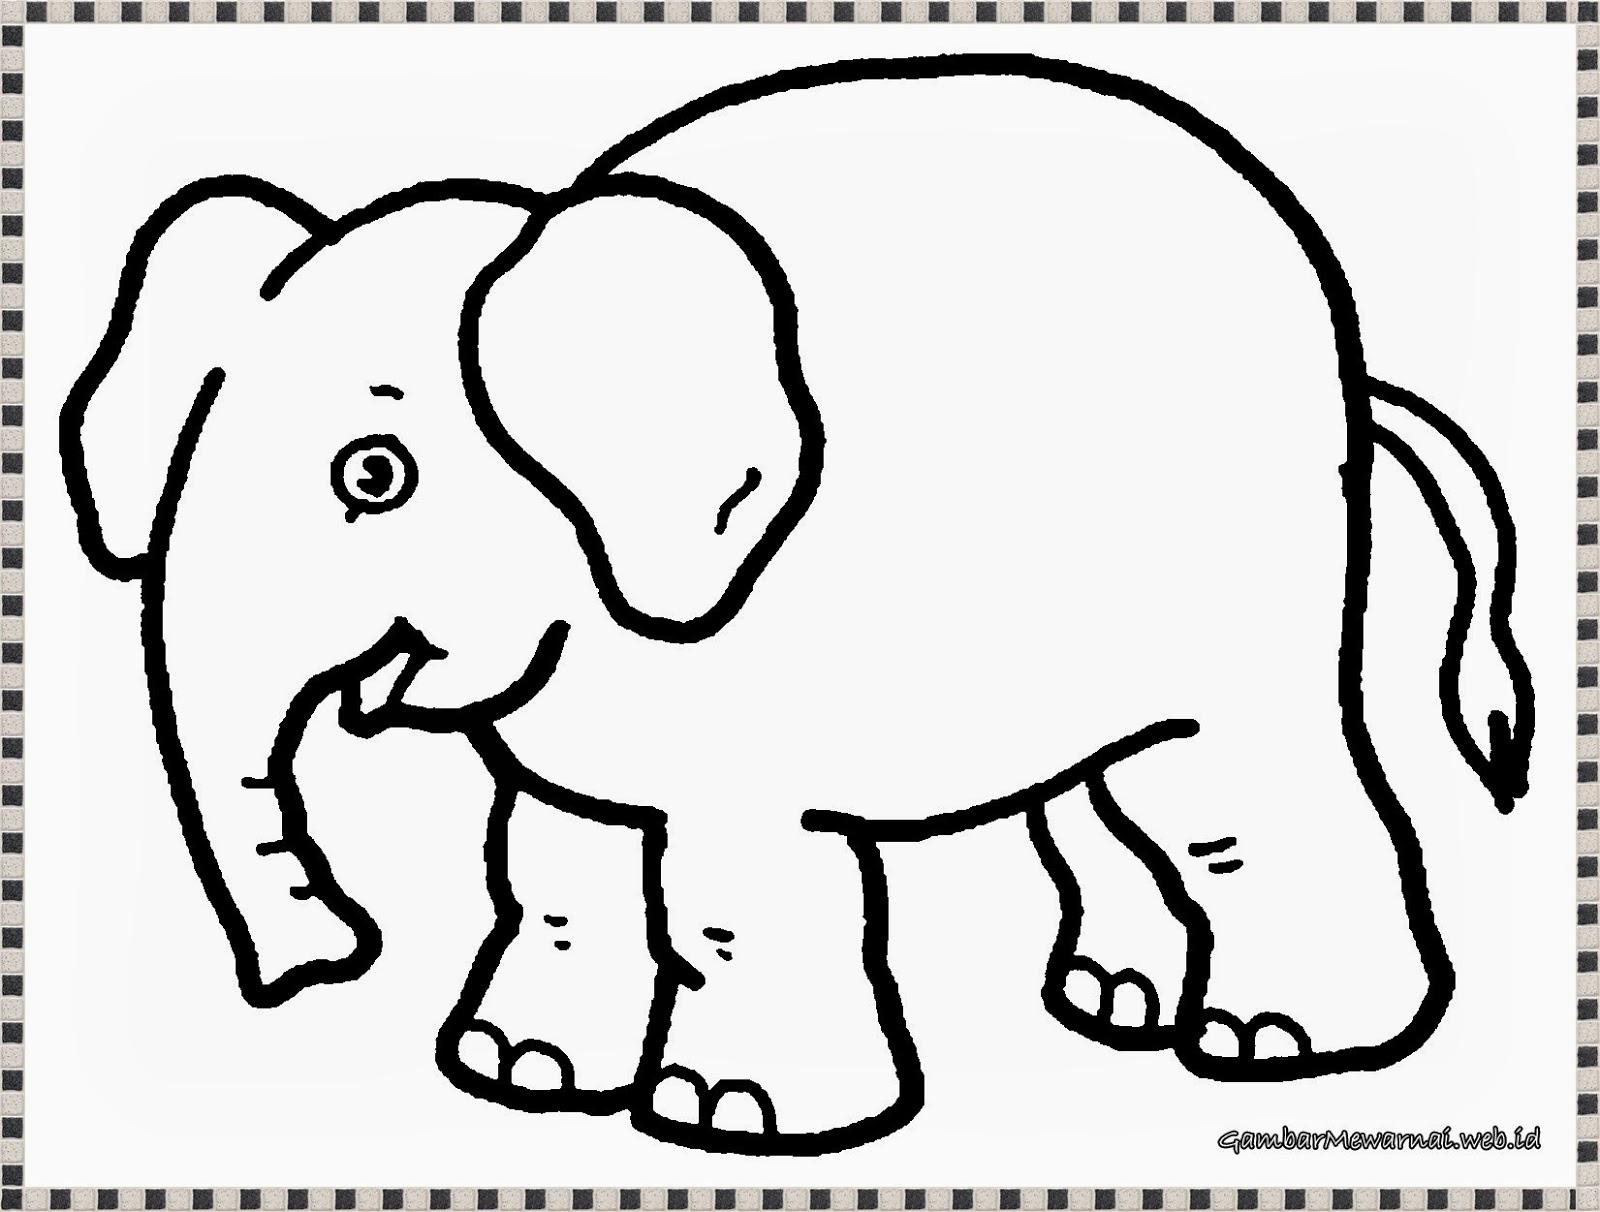 Gambar Mewarnai Gambar Binatang Bliblinews Gajah Apps